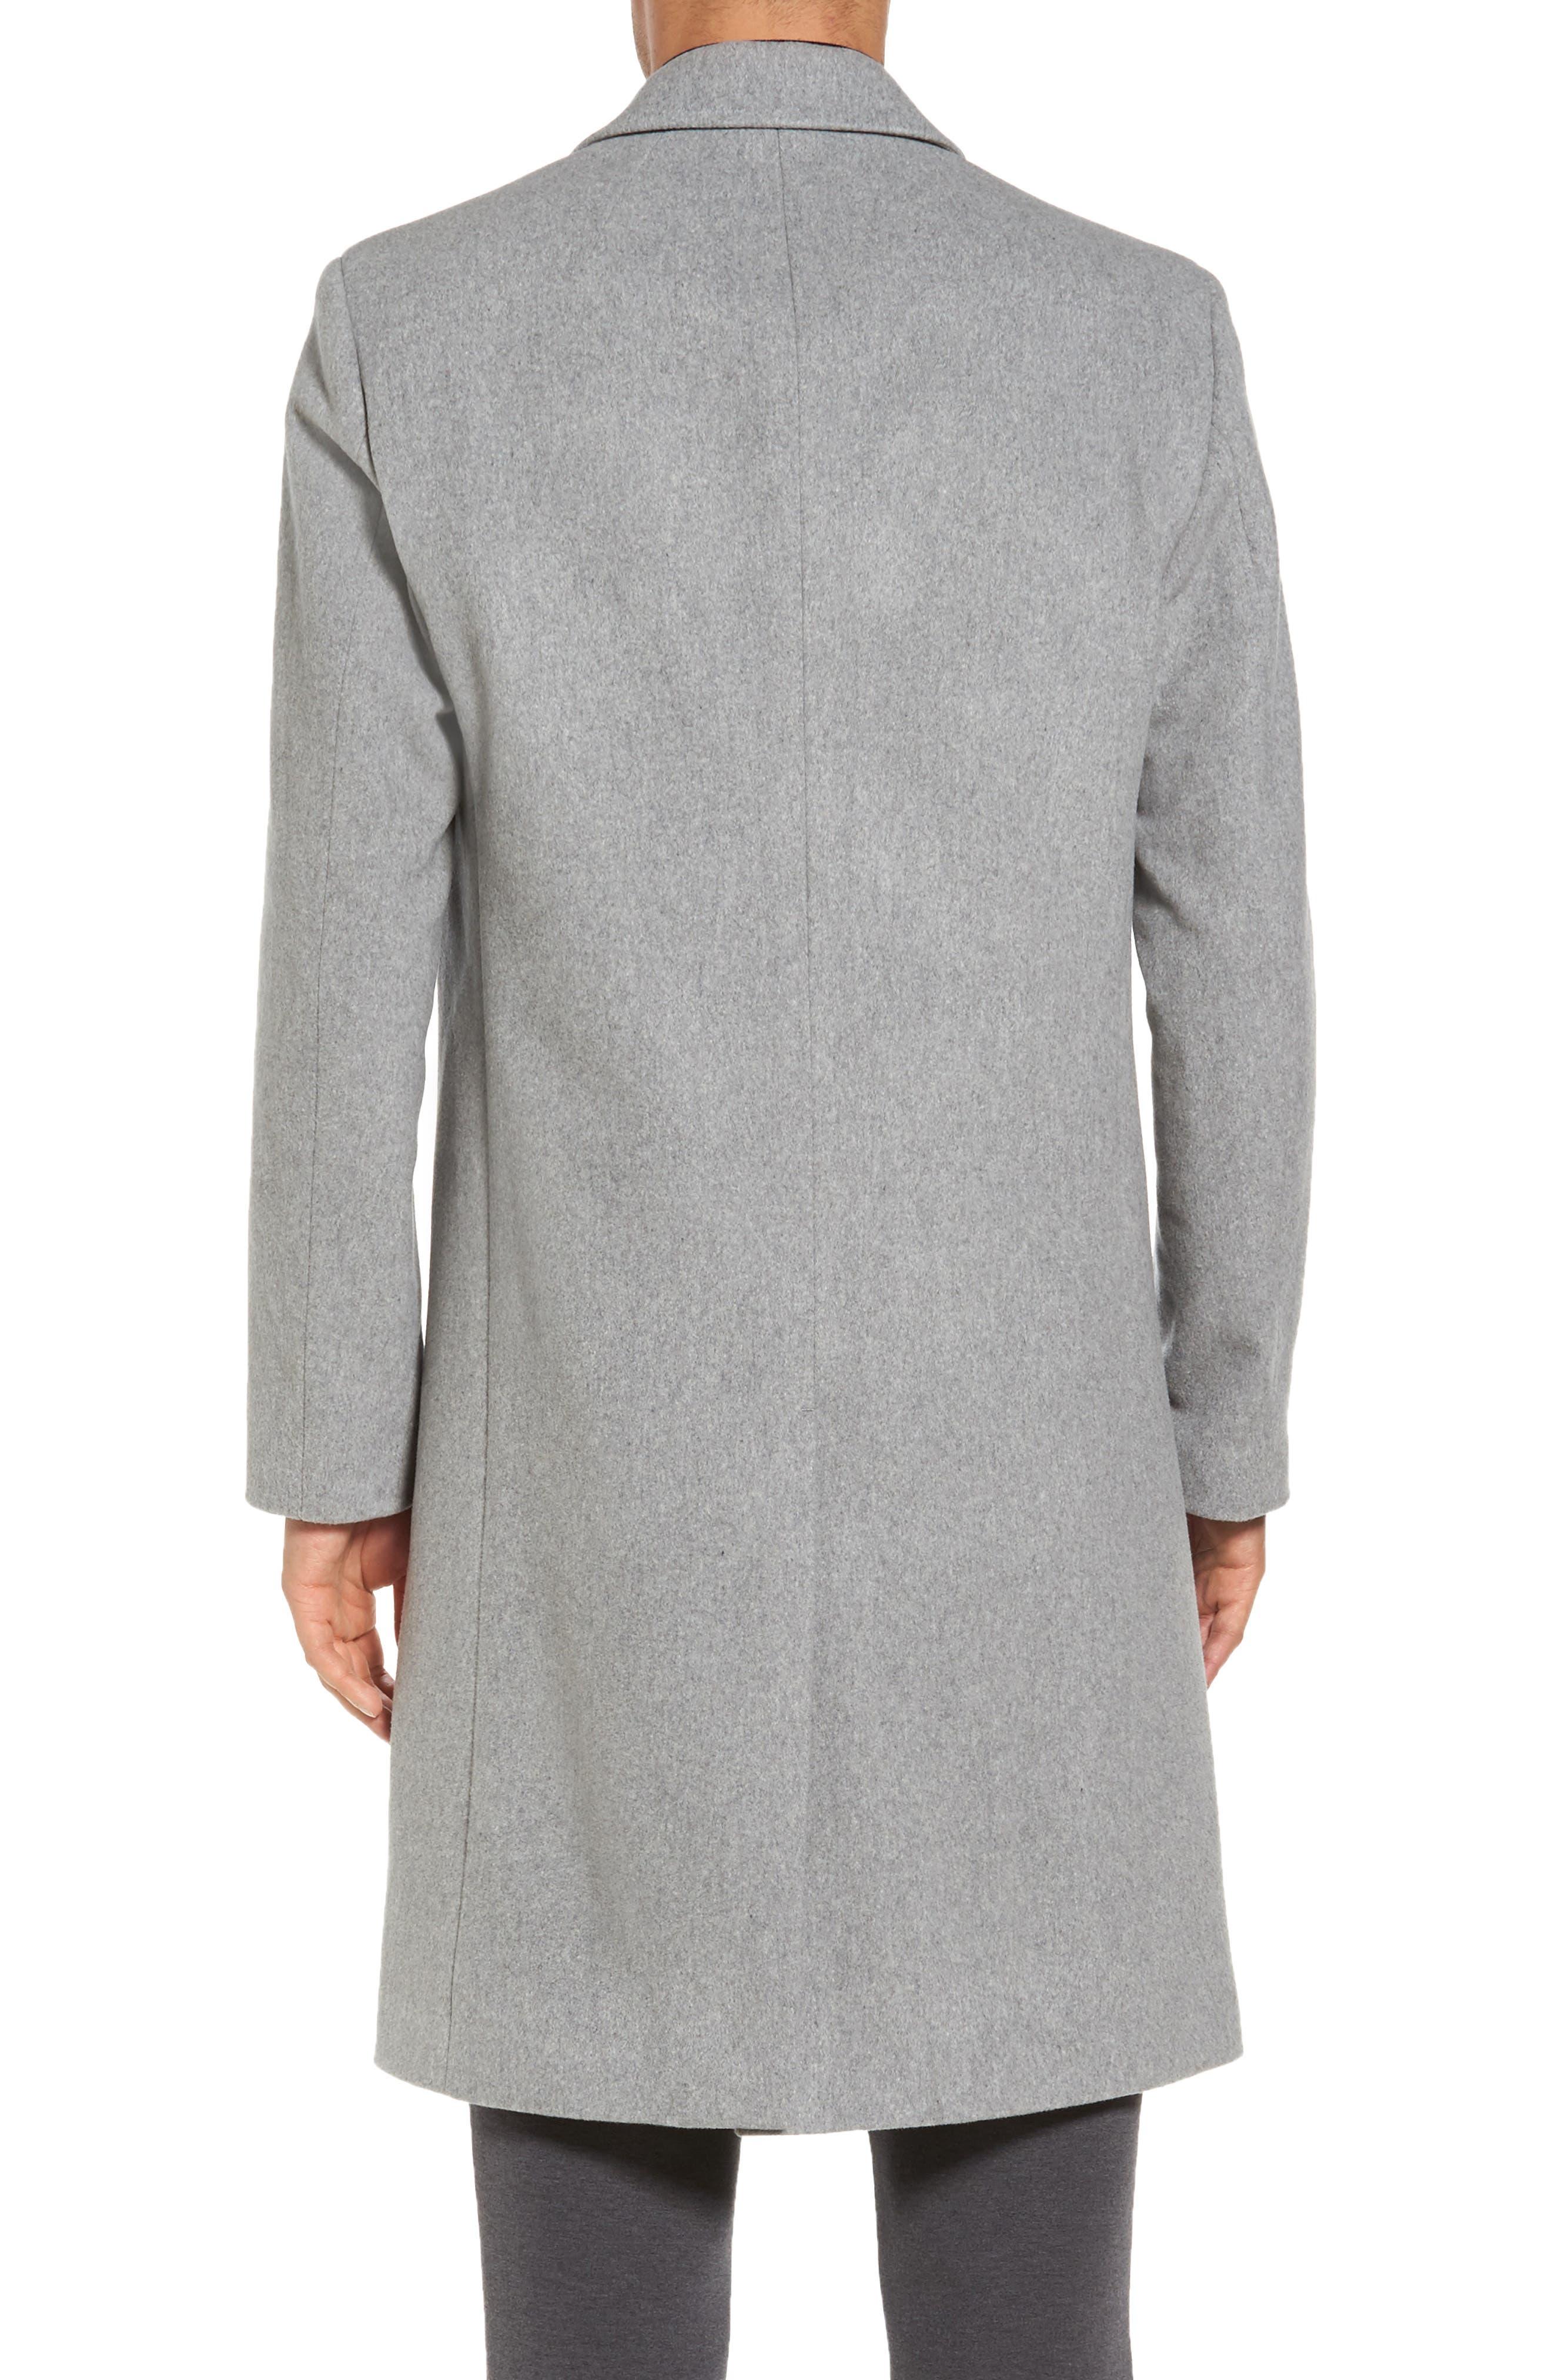 Bower Melton Wool Blend Topcoat,                             Alternate thumbnail 4, color,